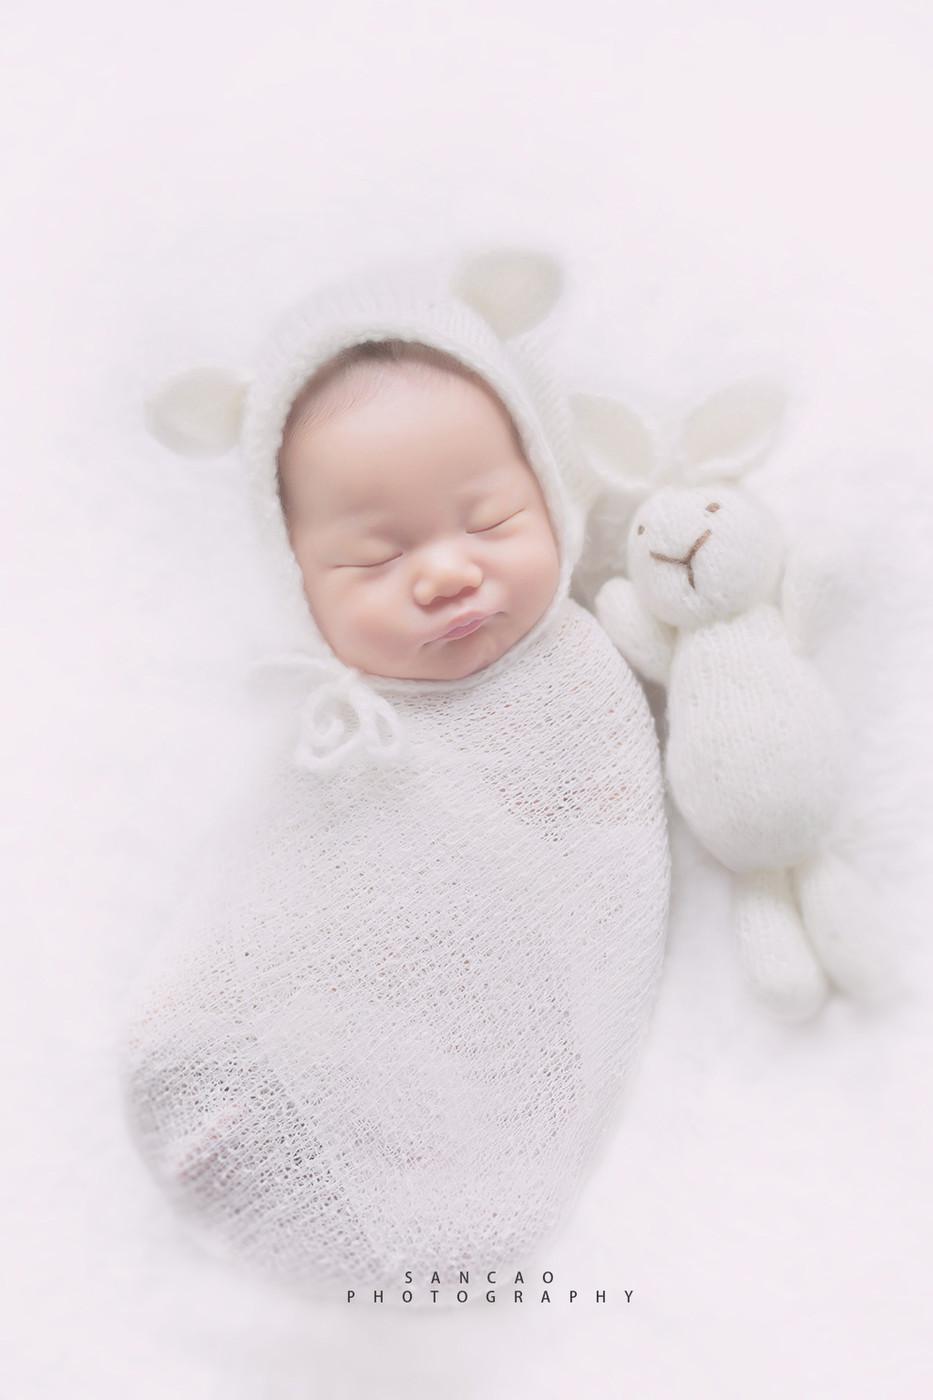 婴儿(0-6个月)2